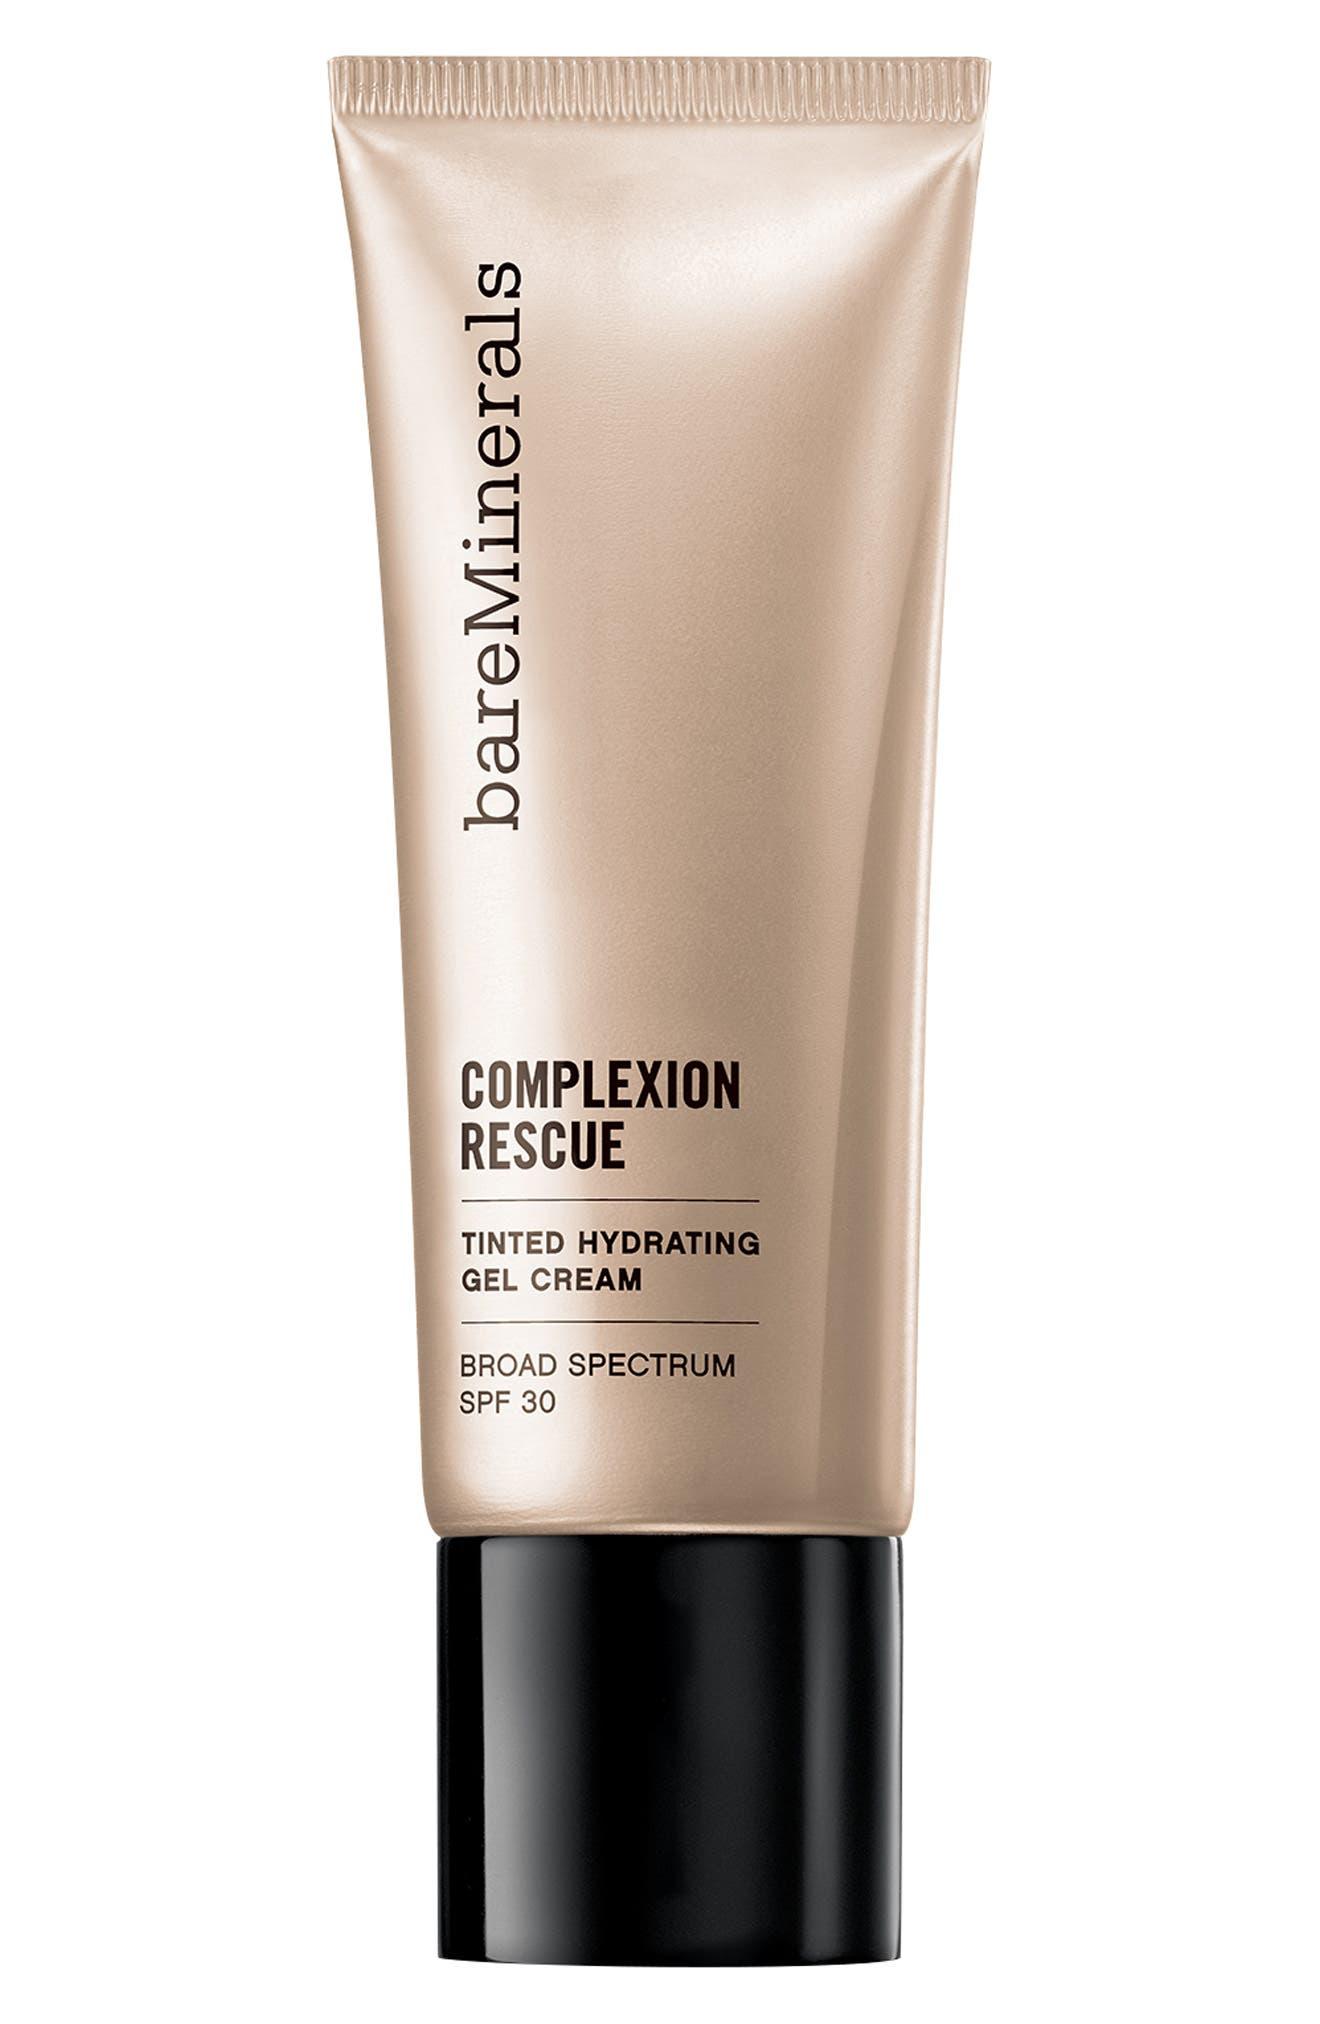 Bareminerals Complexion Rescue(TM) Tinted Moisturizer Hydrating Gel Cream Spf 30